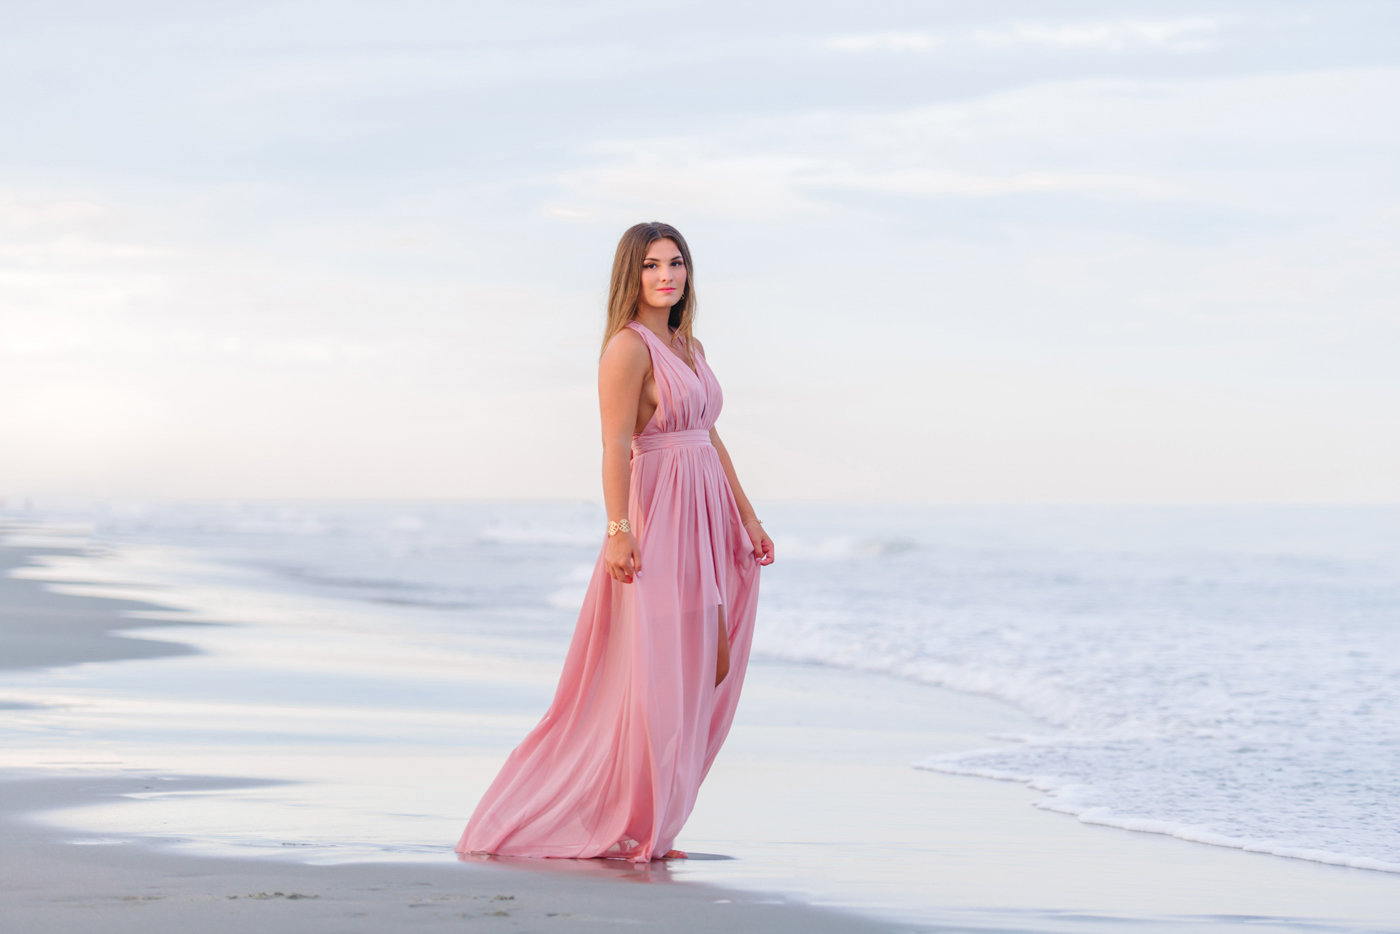 "Myrtle Beach Senior Photographers - Senior Beach Photos - High School Senior Pictures"" width="